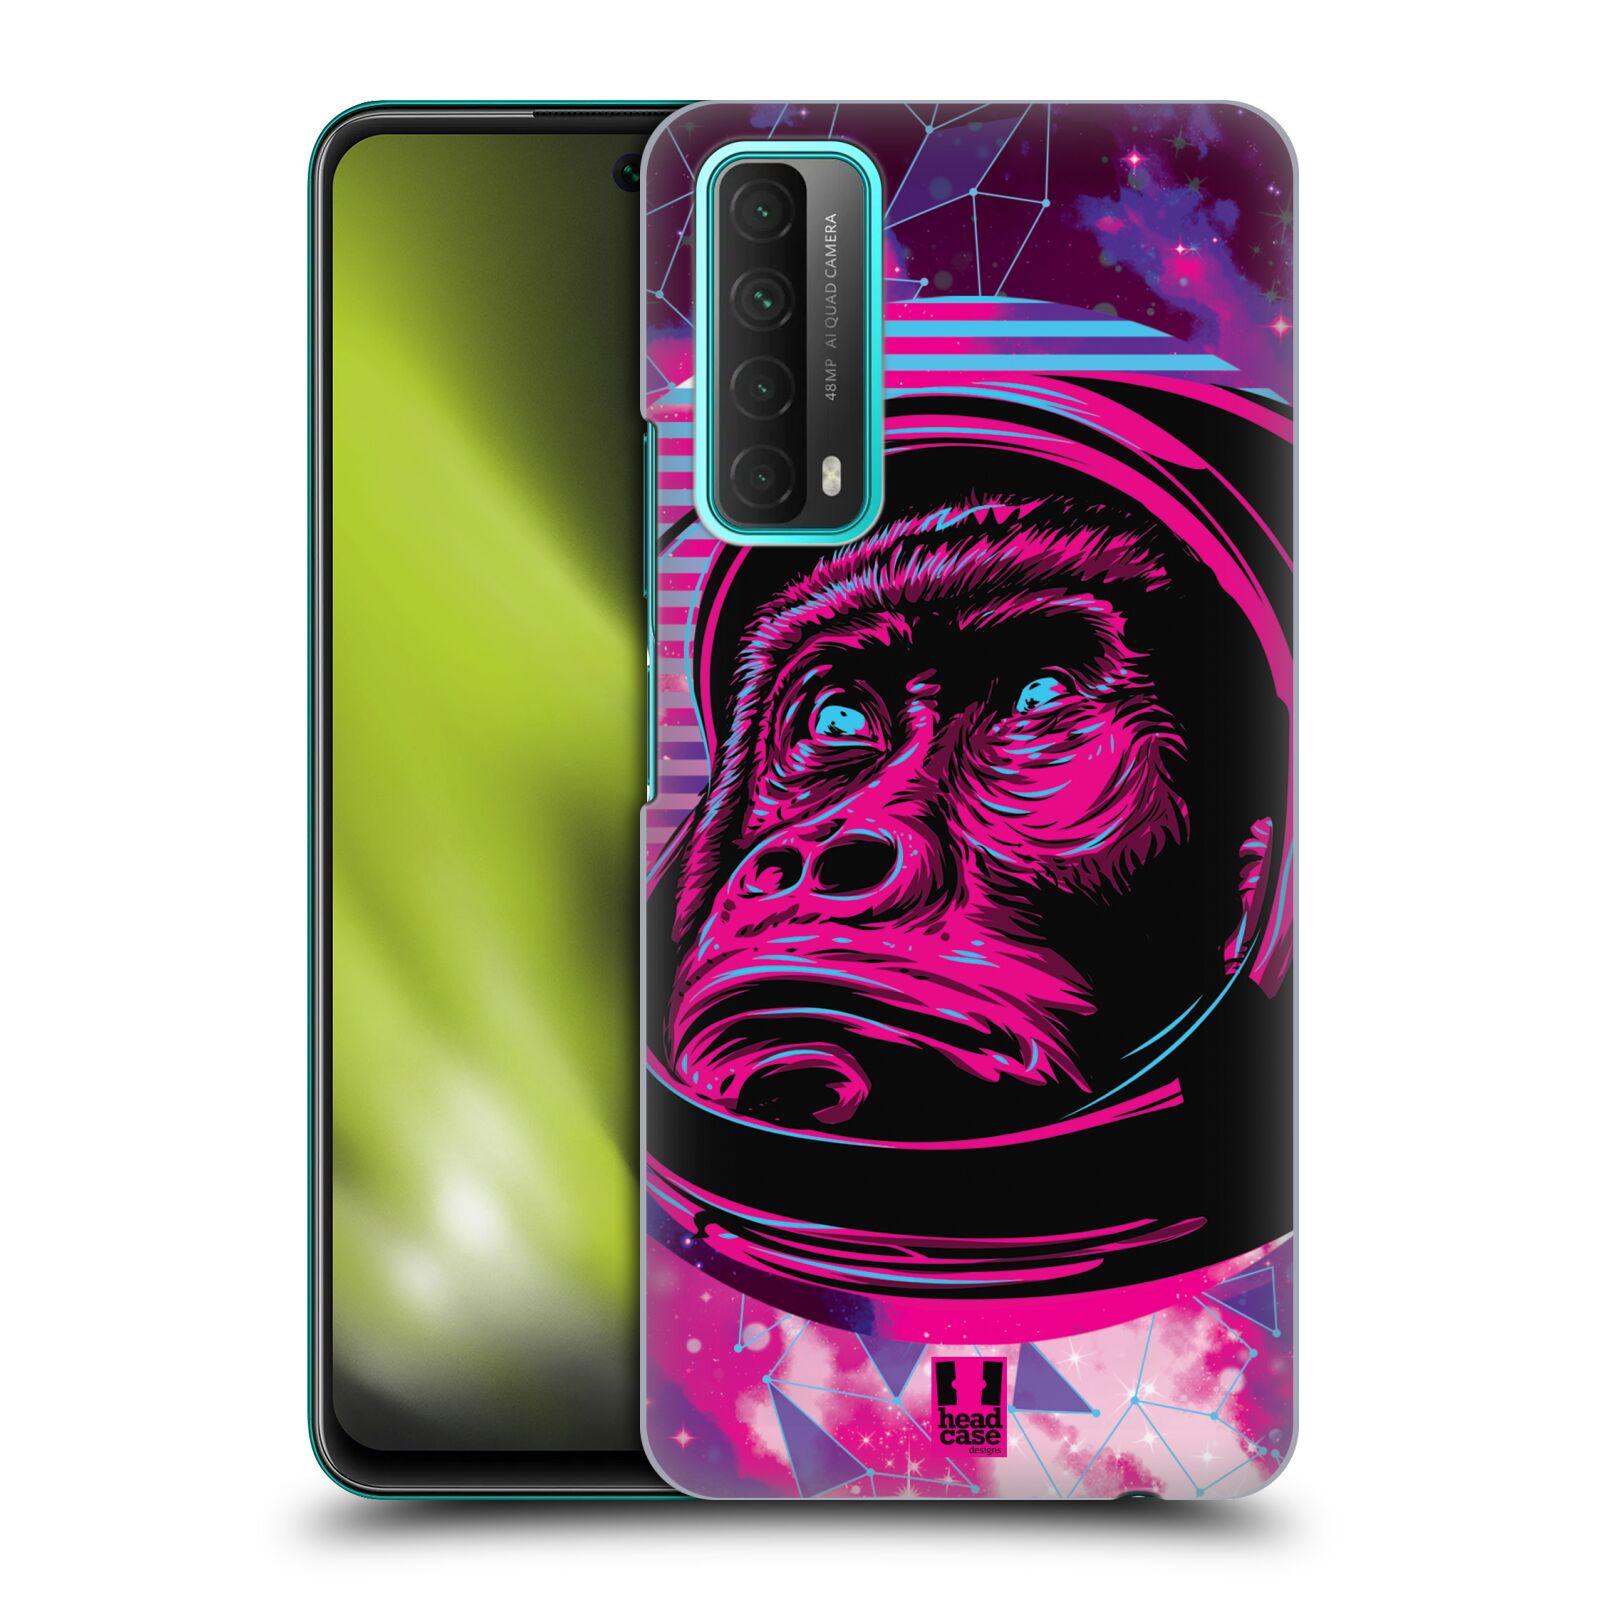 Plastové pouzdro na mobil Huawei P Smart (2021) - Head Case - Gorila ve skafandru